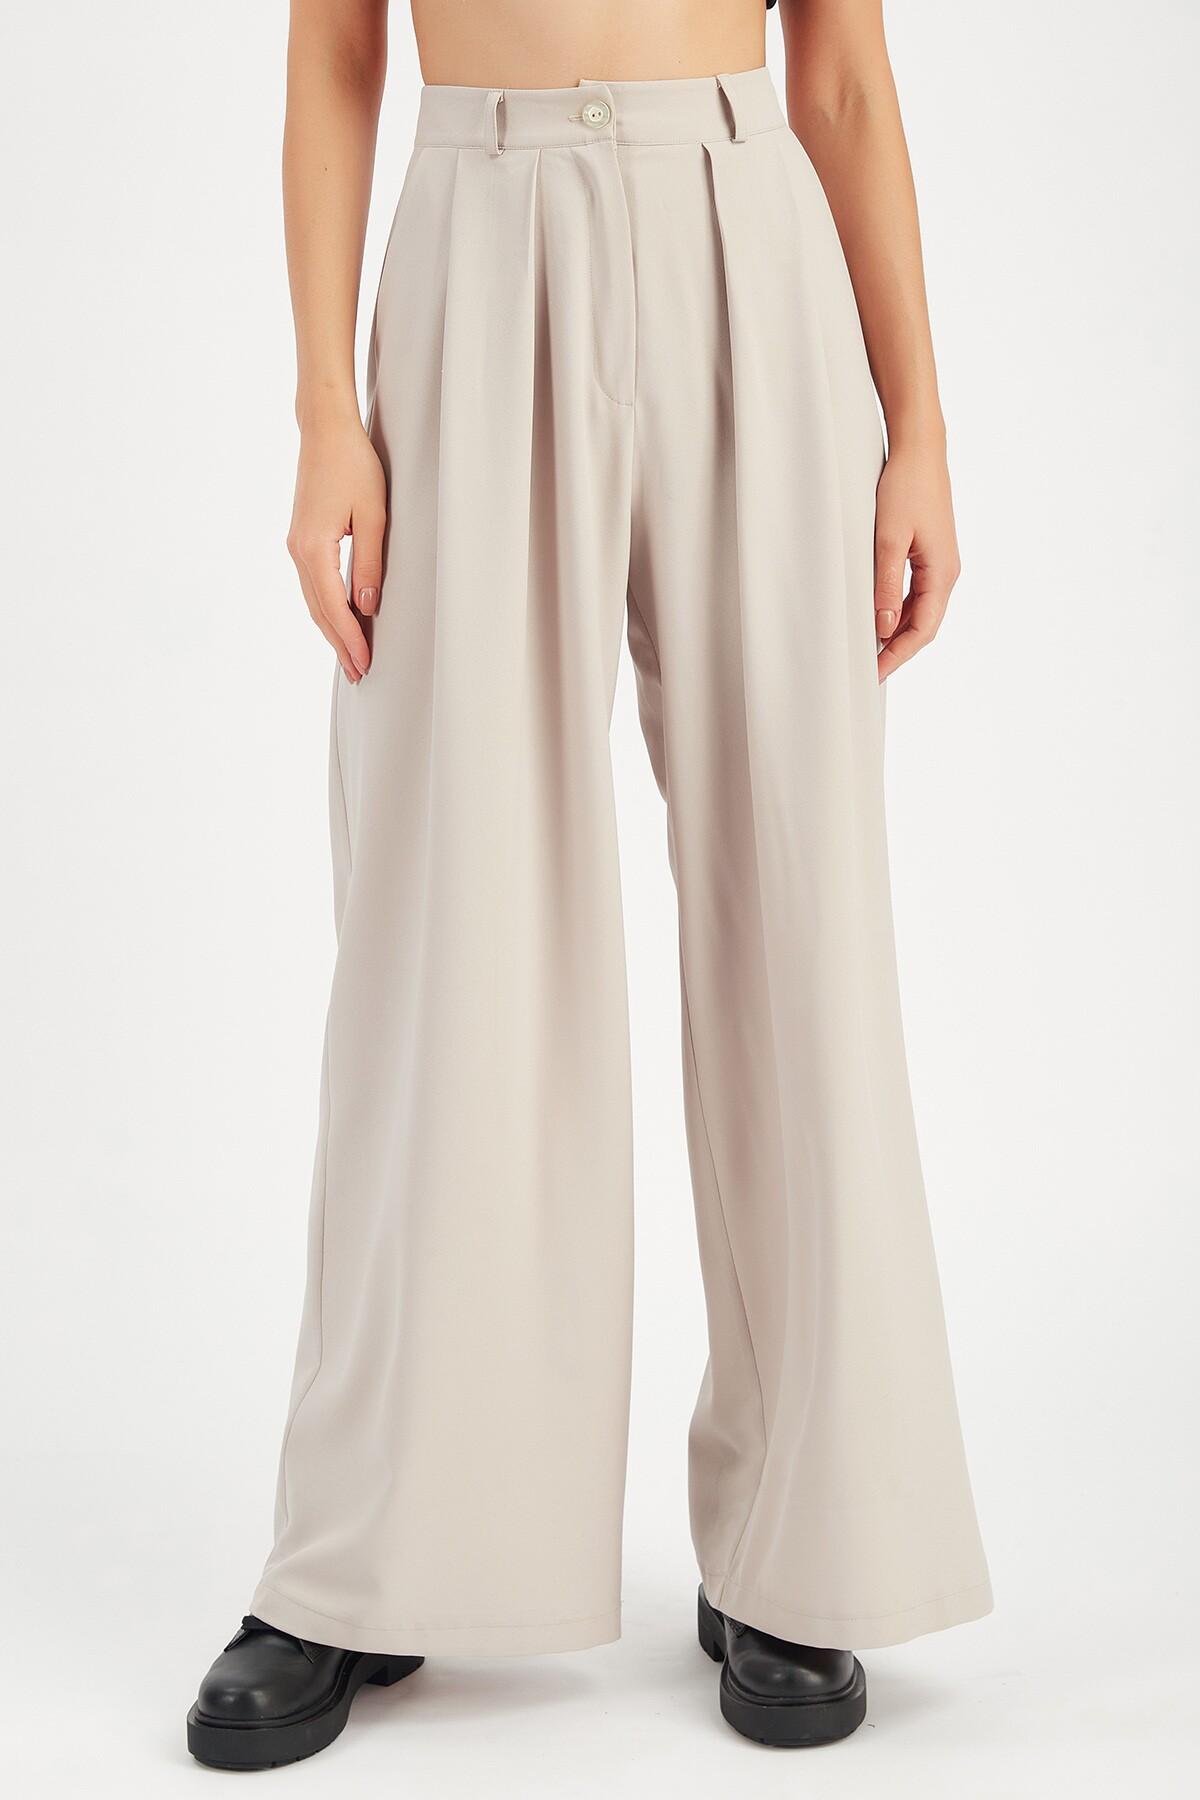 Taş Kadın Pantolon   Mk21W660129